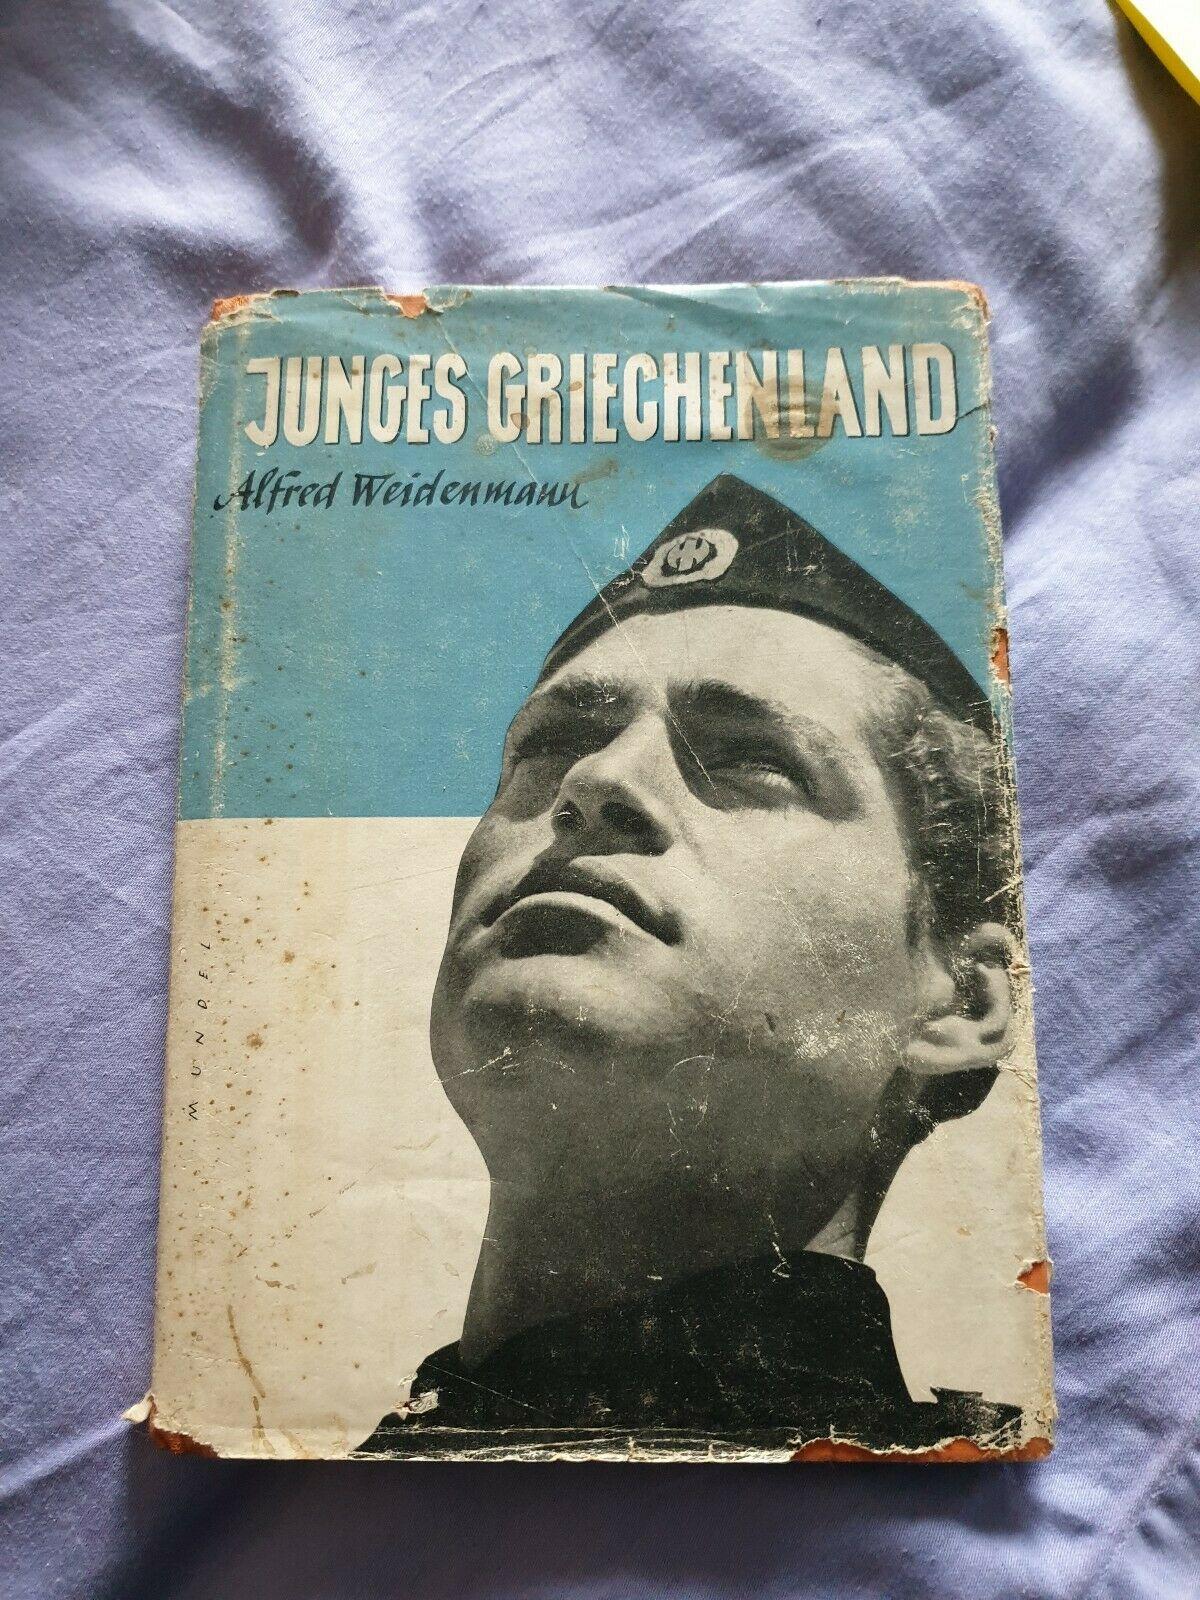 Junges-Griechenland-Alfred-Weidenmann-1940